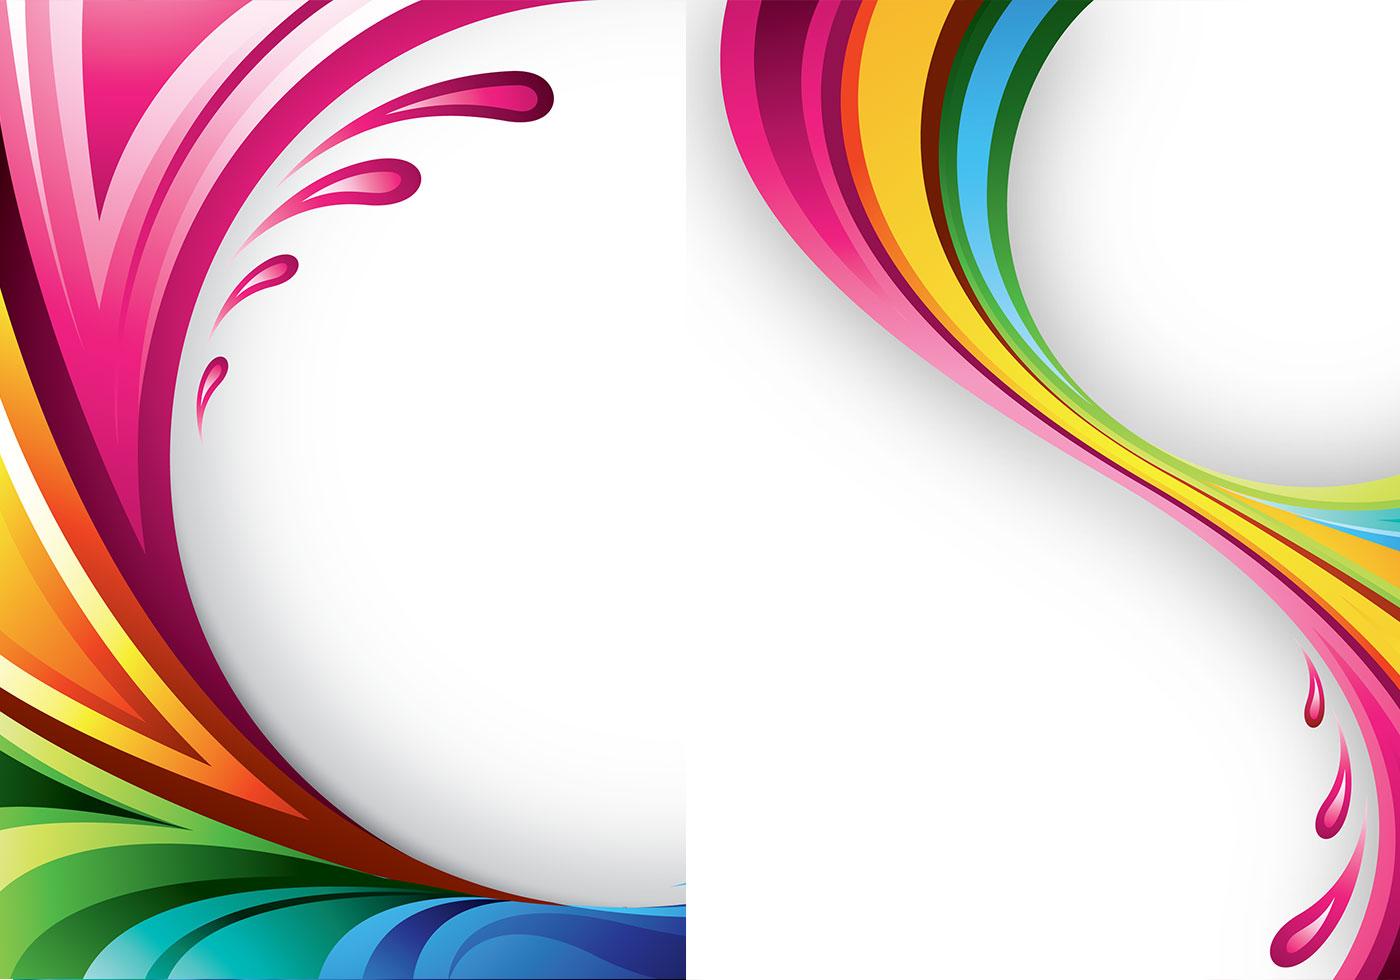 Color Splash Vector Wallpaper Pack